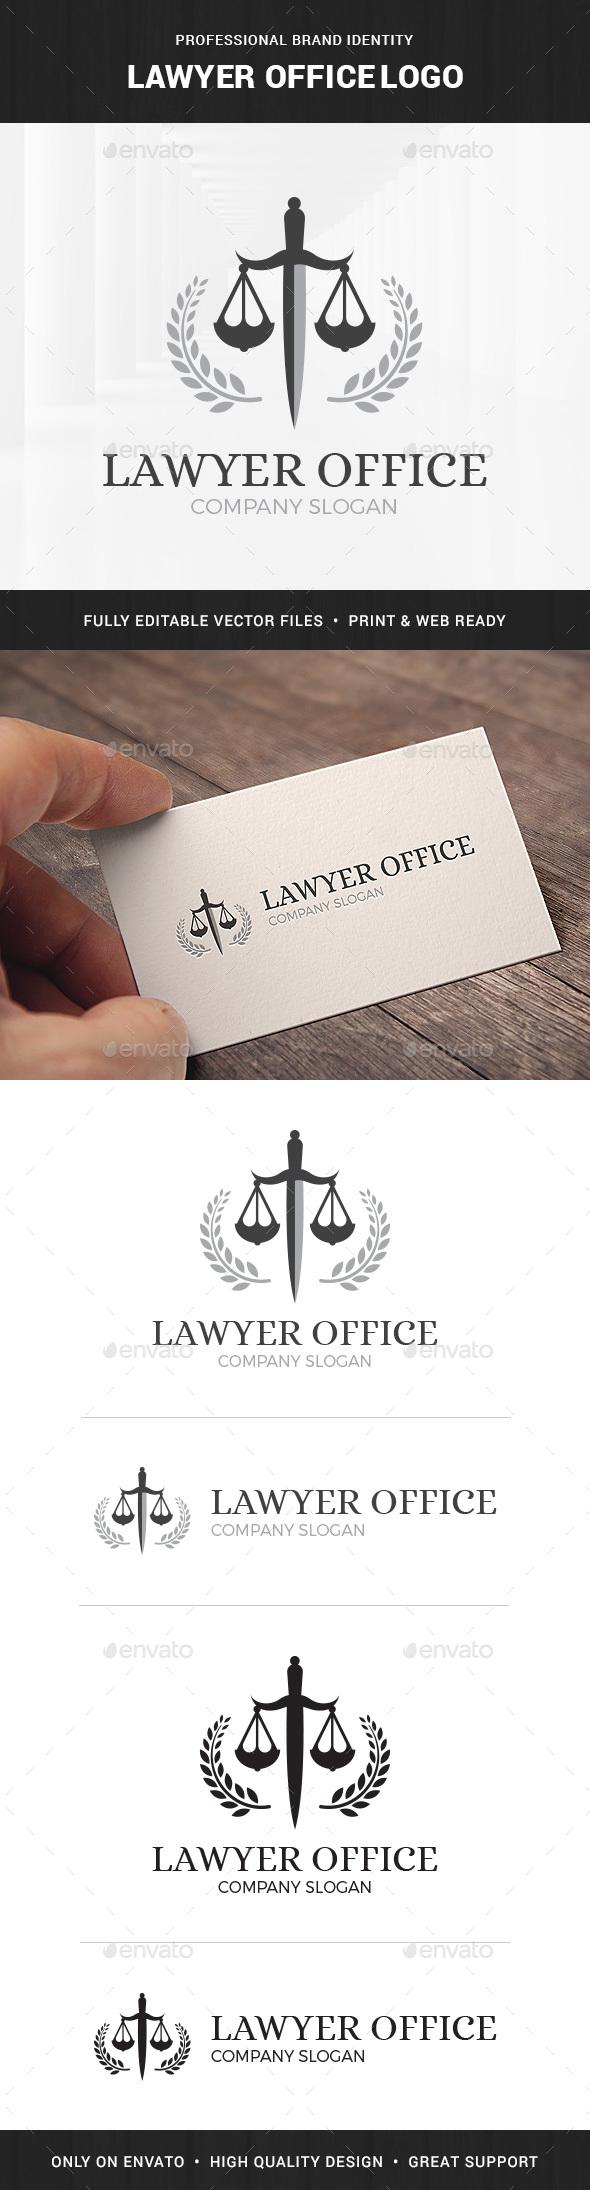 Lawyer Office Logo Template - Symbols Logo Templates